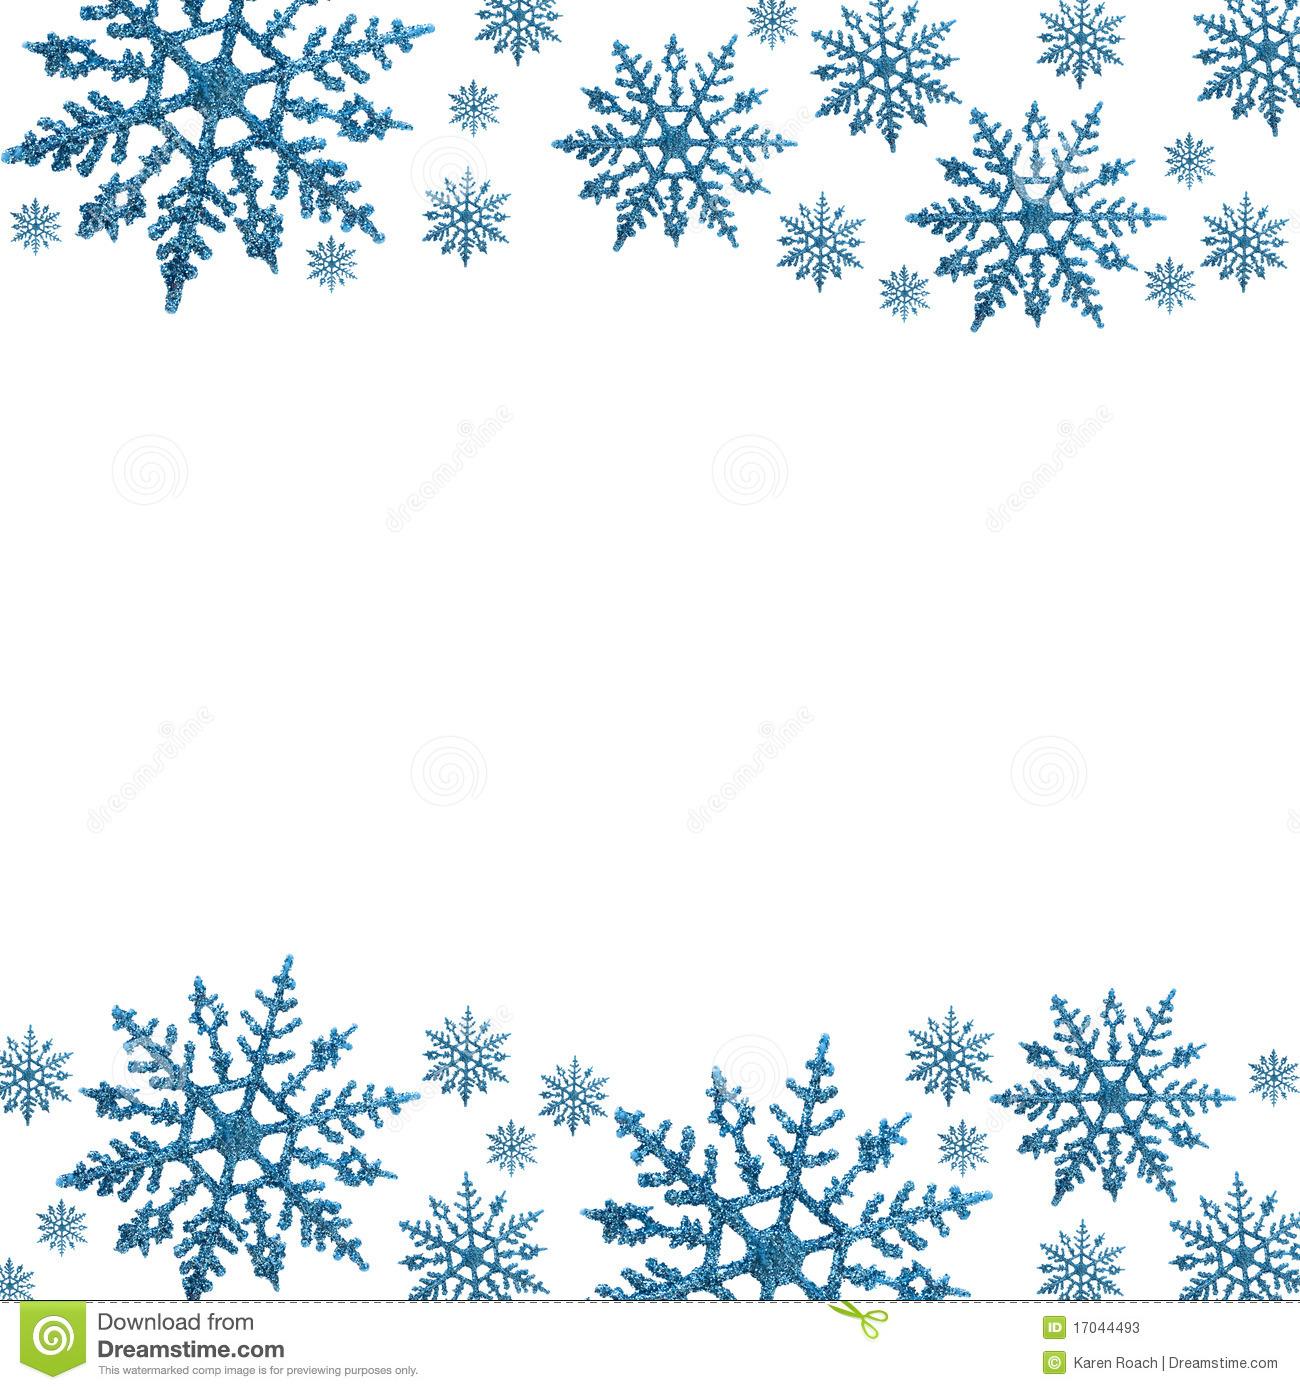 Snowman Border Clip Art Winte - Snowflake Clipart Border